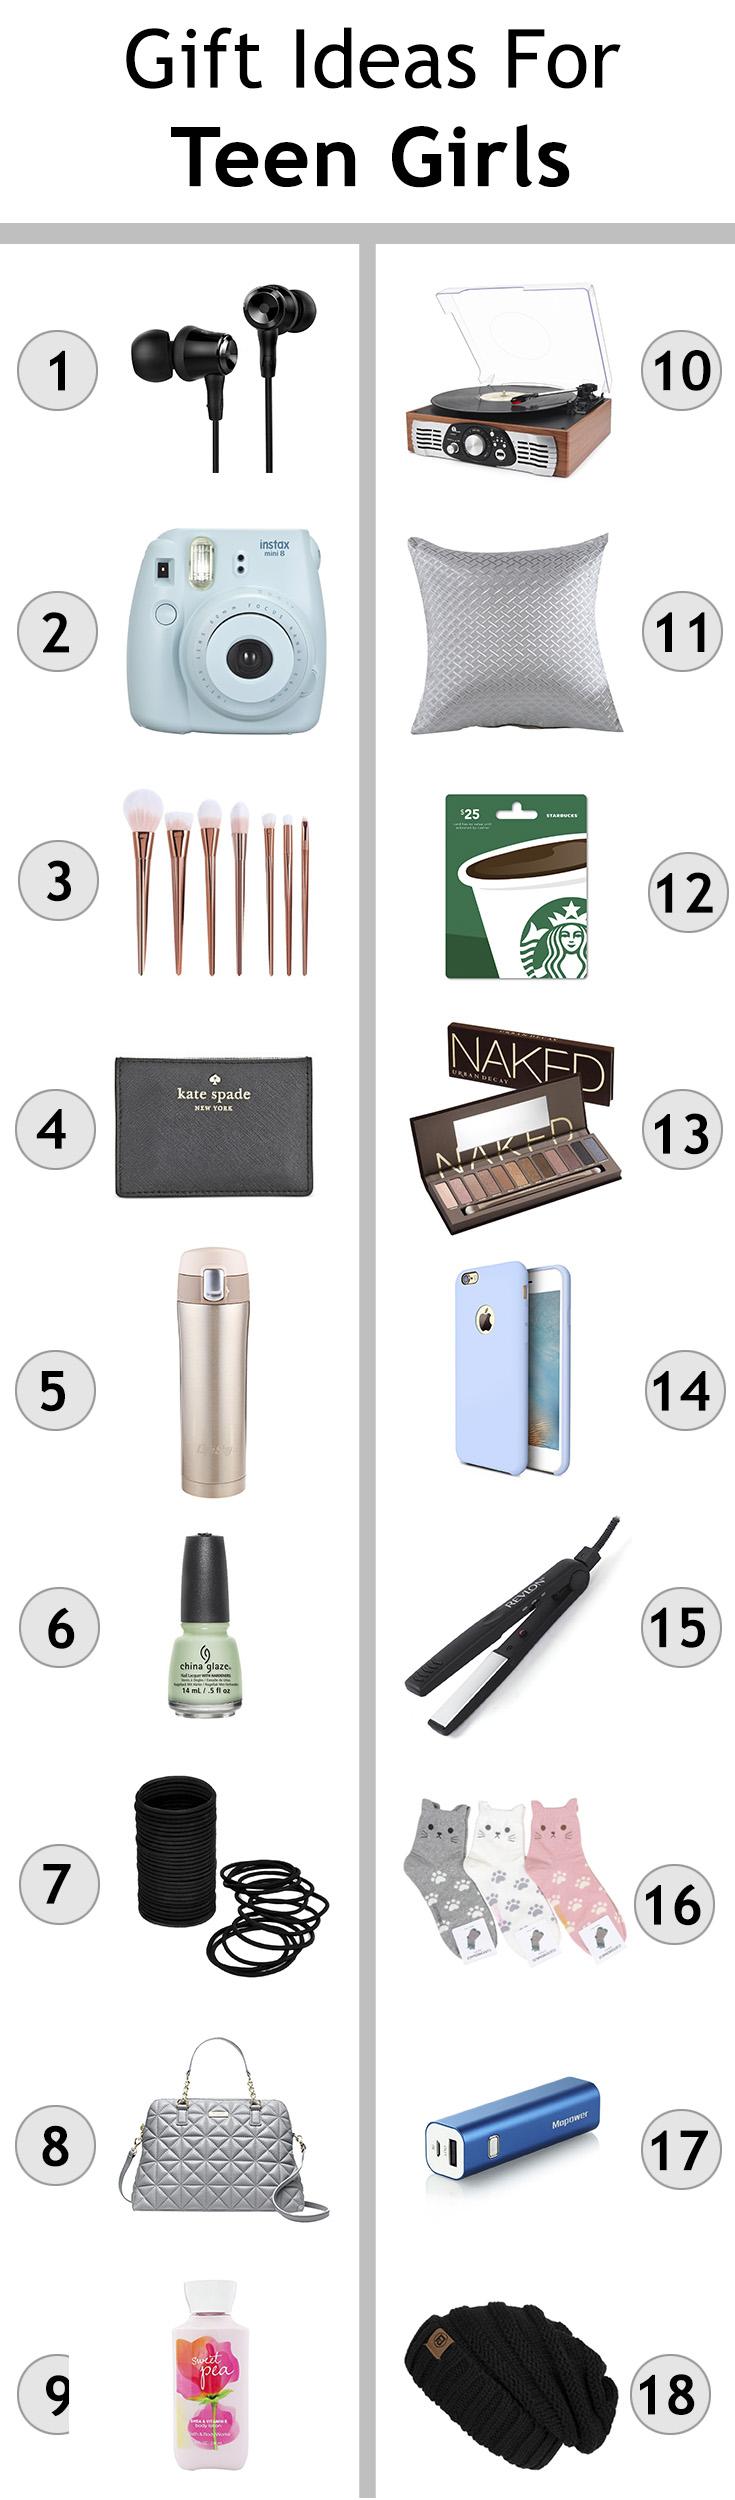 Top ten gifts for teen girls